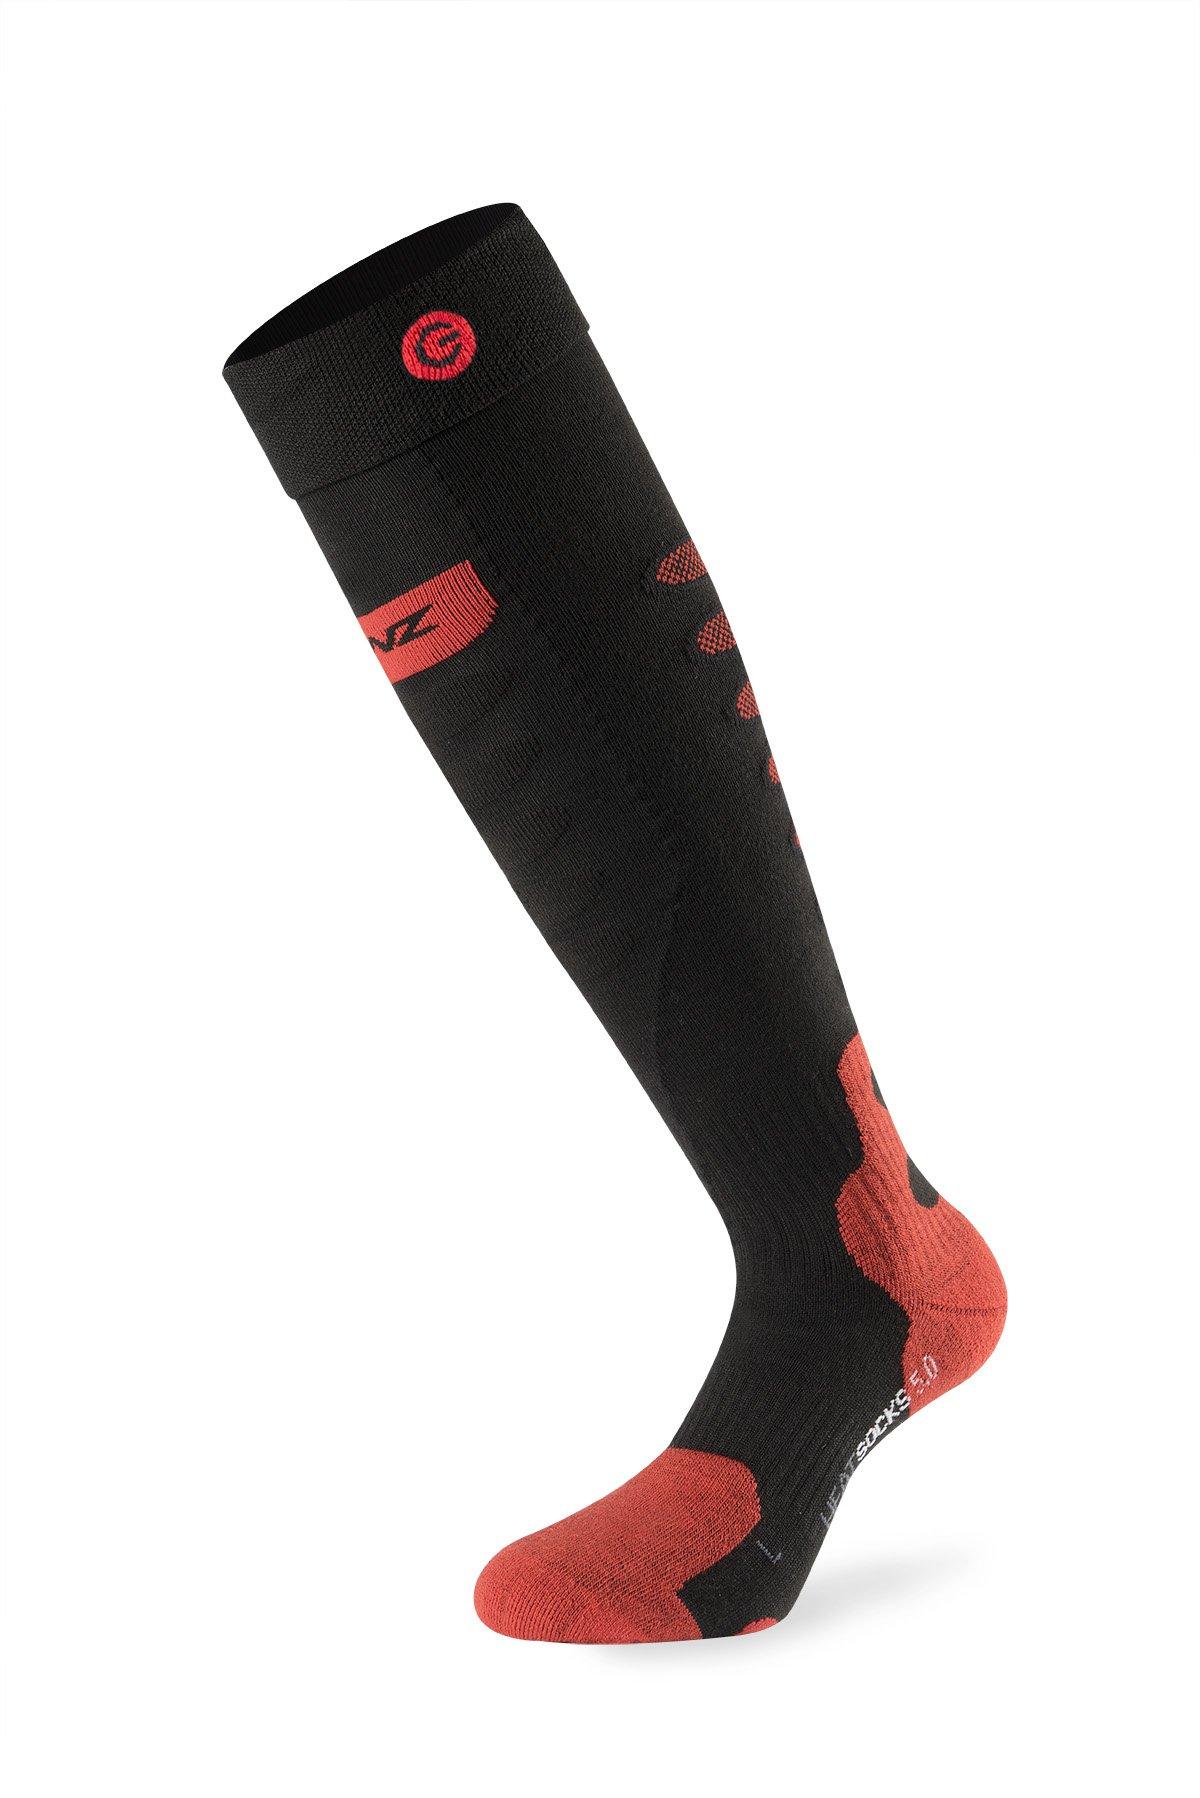 Vyhrievané ponožky Lenz Heat Socks 5.0 Toe Cap